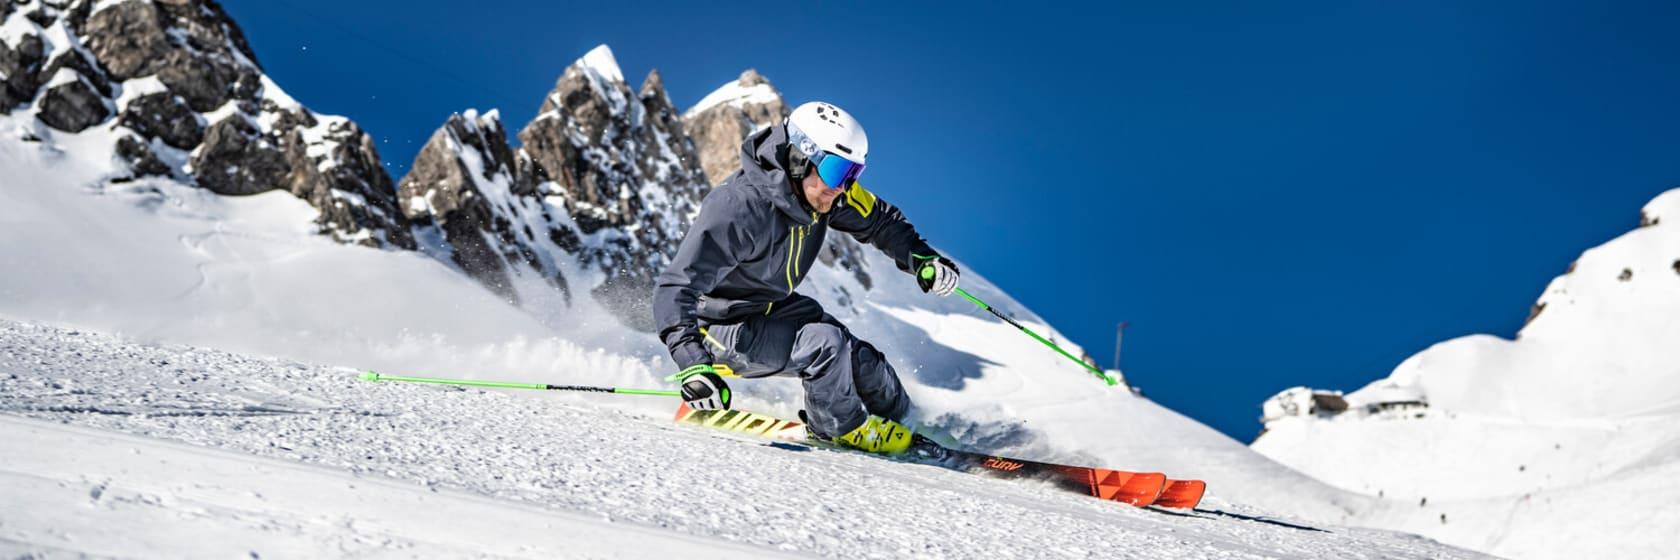 Skiløber på pisten i den hvide sne på skiferie i Alperne